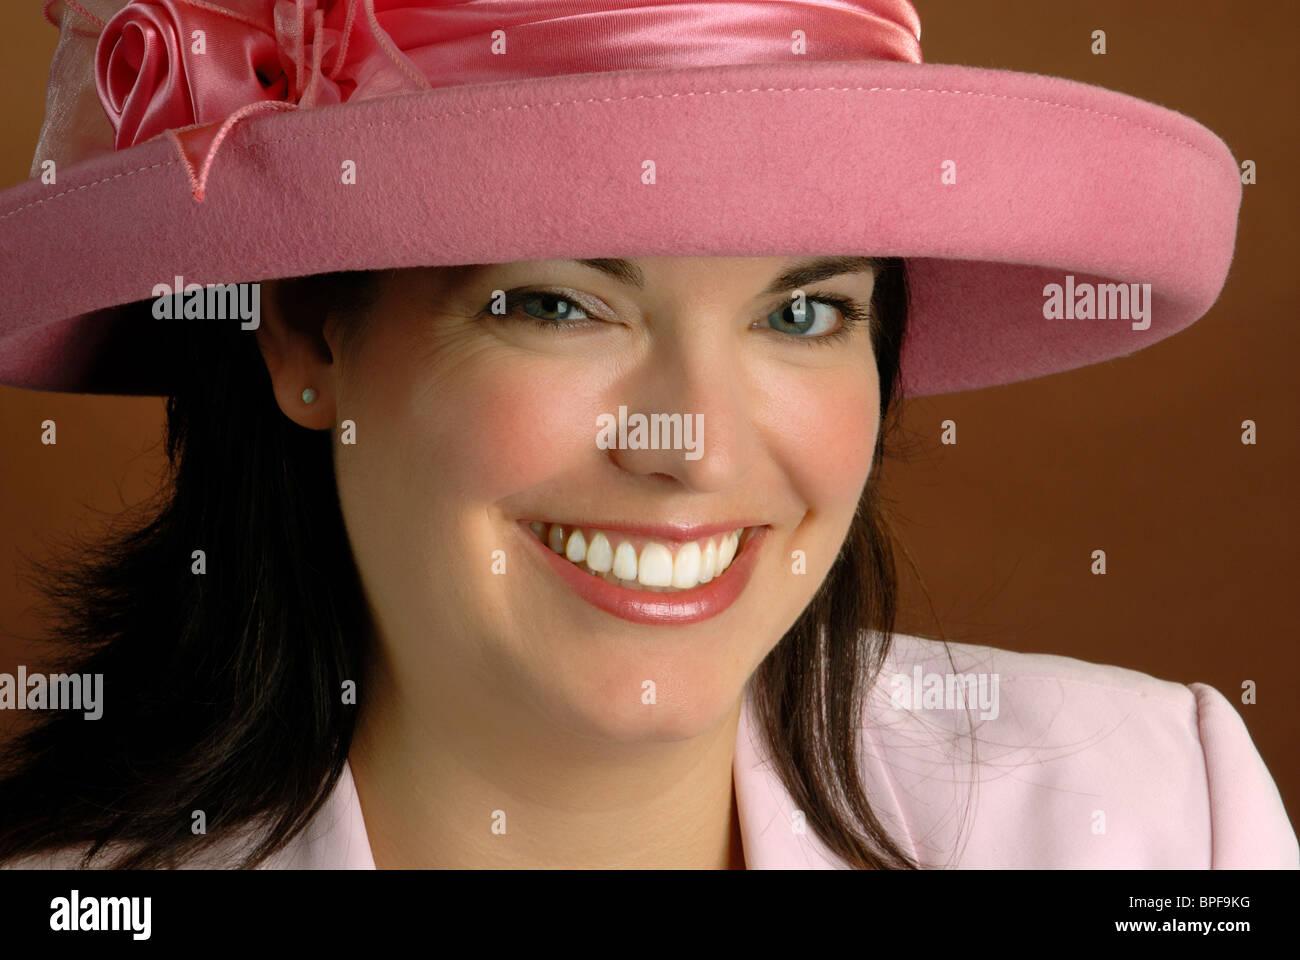 Atractiva mujer joven con un Sombrero de estilo Ascot Rosa Imagen De Stock ad536e2f13d5